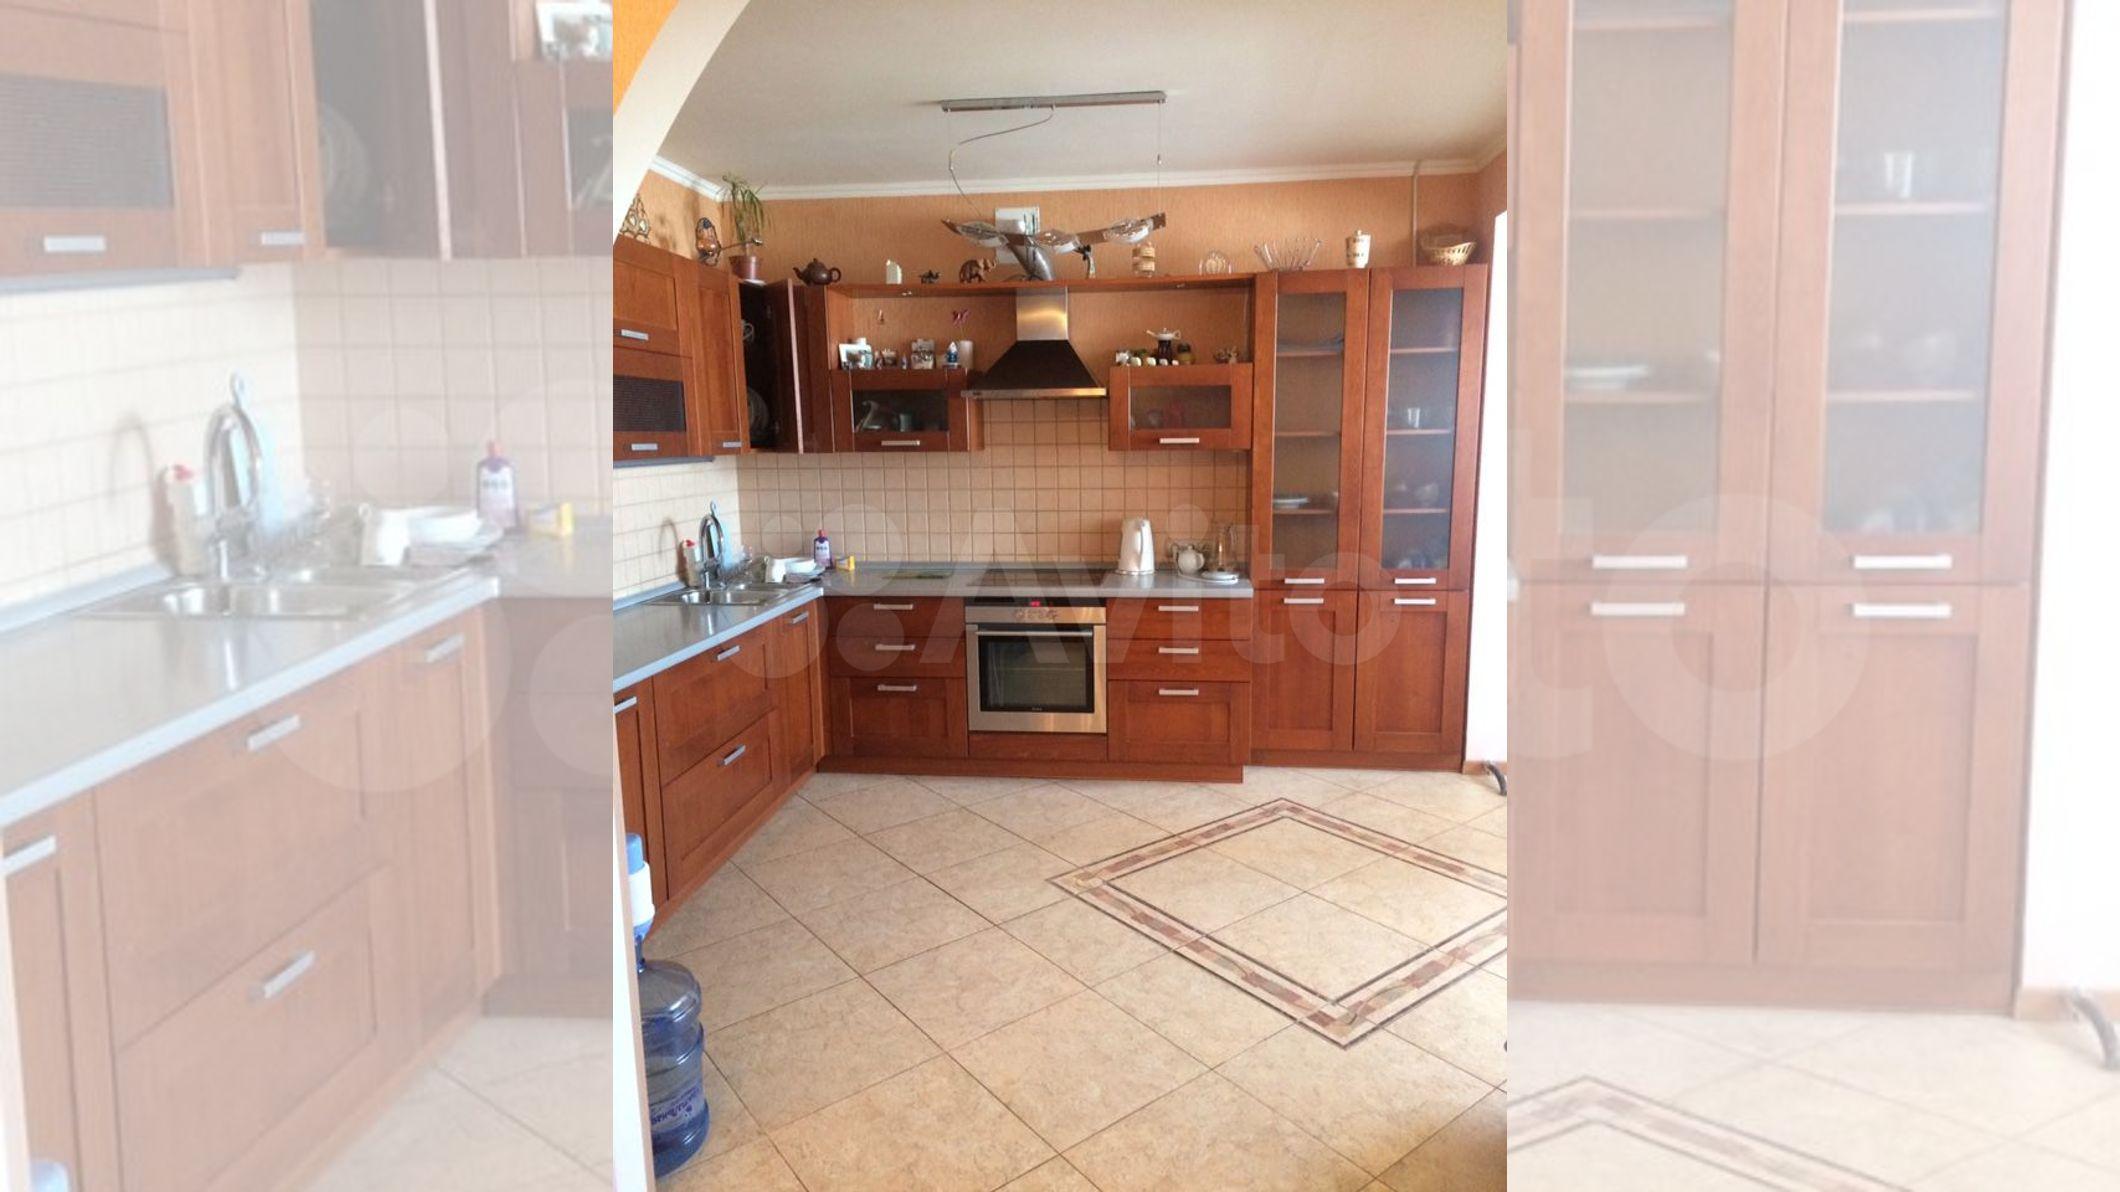 2-к квартира, 82 м², 12/14 эт. в Самарской области | Покупка и аренда квартир | Авито